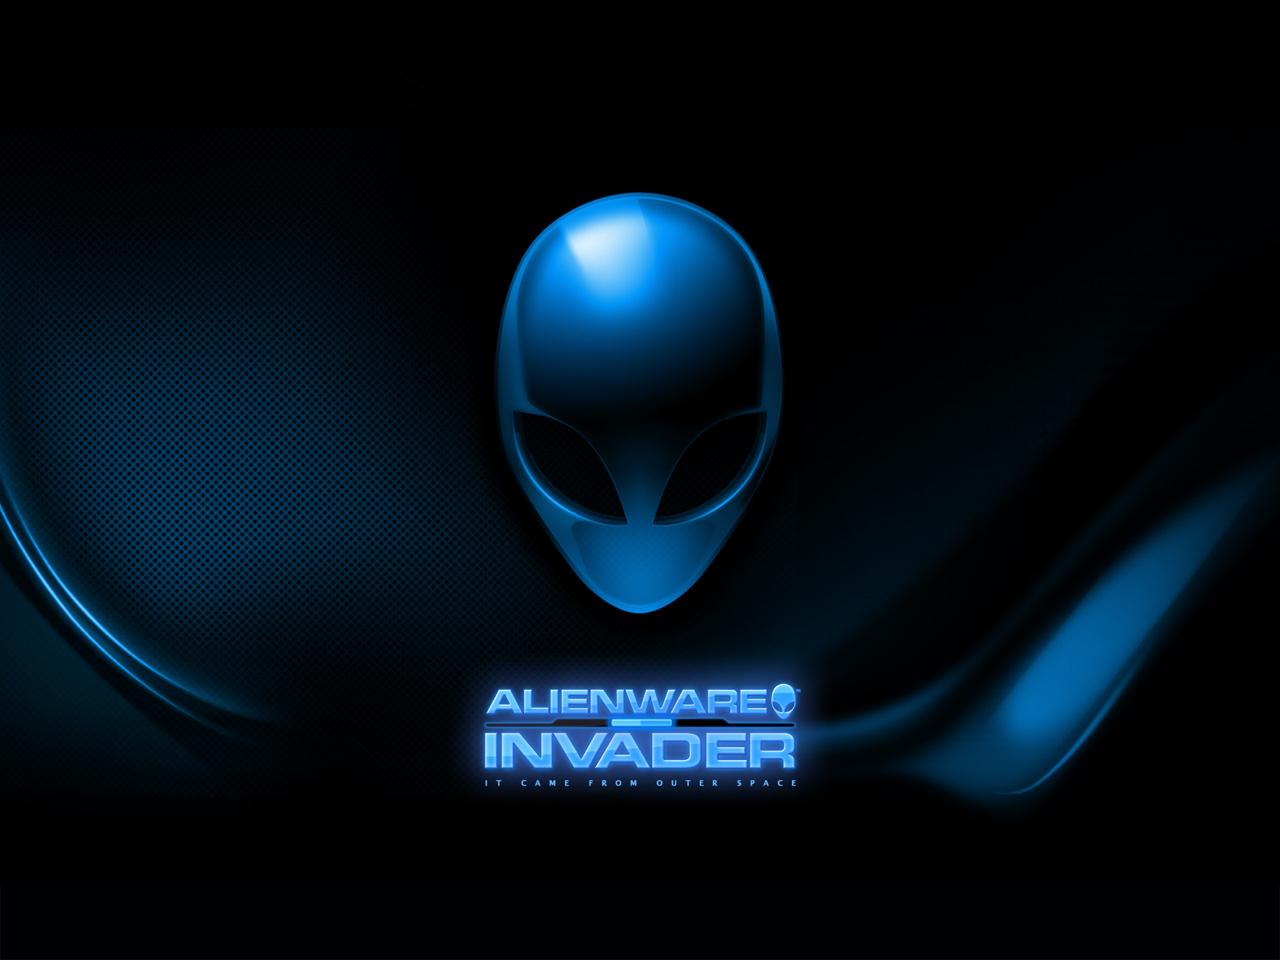 http://1.bp.blogspot.com/-O94dRAK3_Fc/TqvcXS7ed1I/AAAAAAAAB9M/N4NYYu23kTc/s1600/Alienware-Invaderr-Wallpaper.jpg